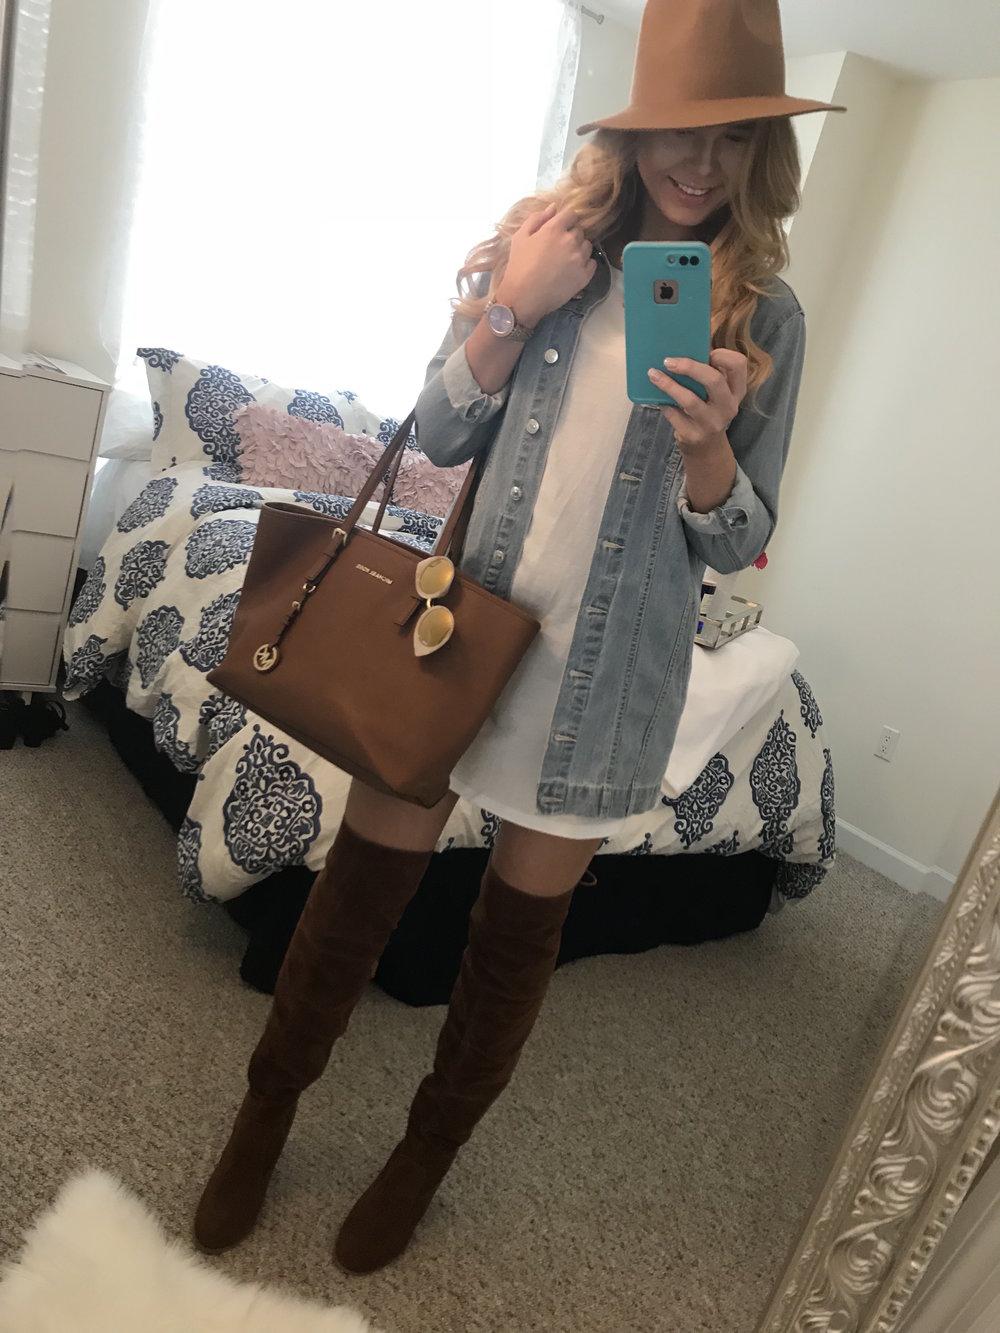 jean jacket dress outfit .jpeg